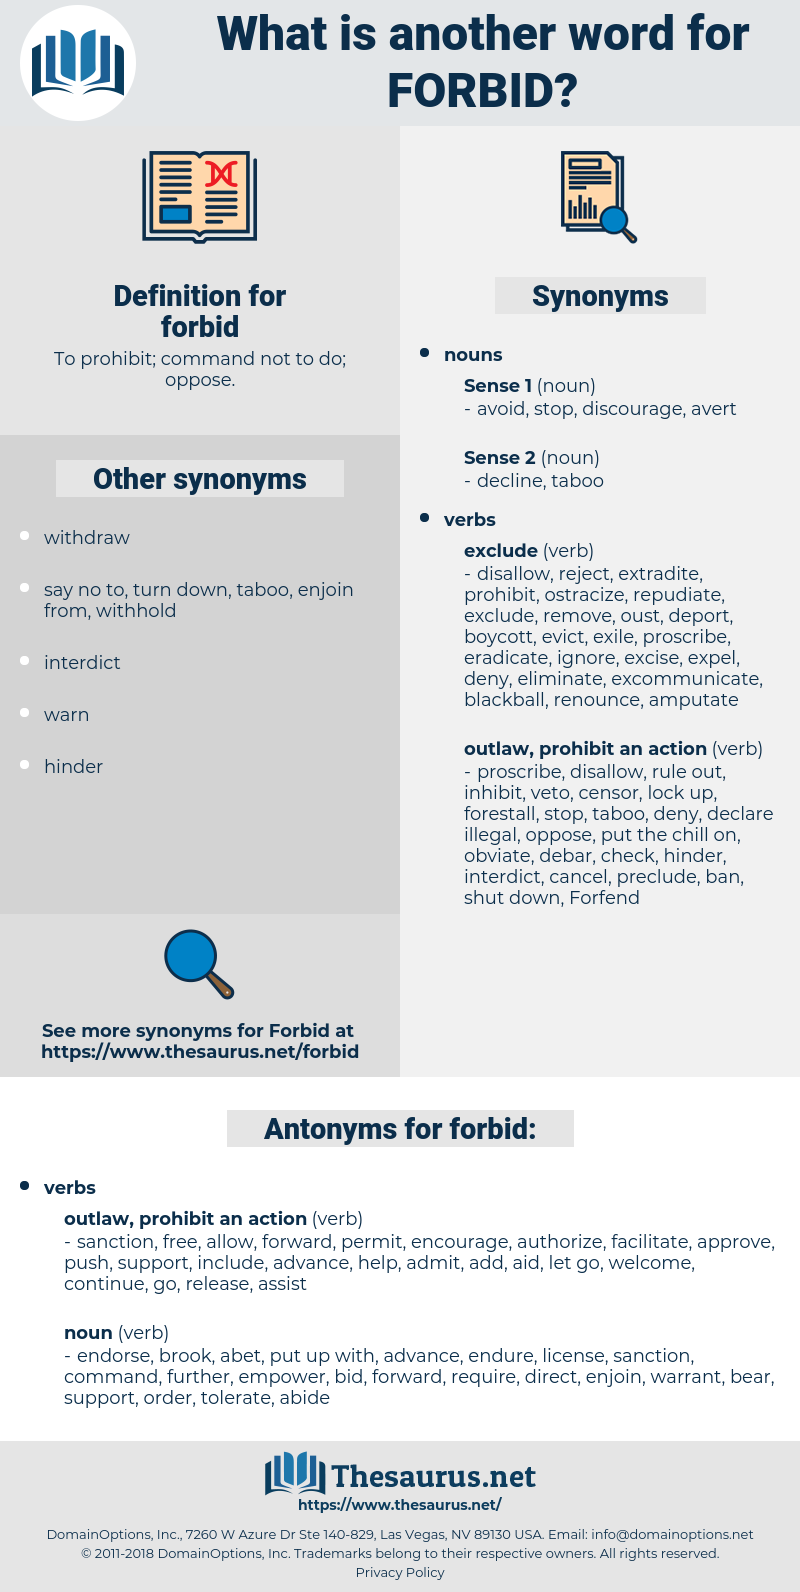 Synonyms for FORBID, Antonyms for FORBID - Thesaurus net